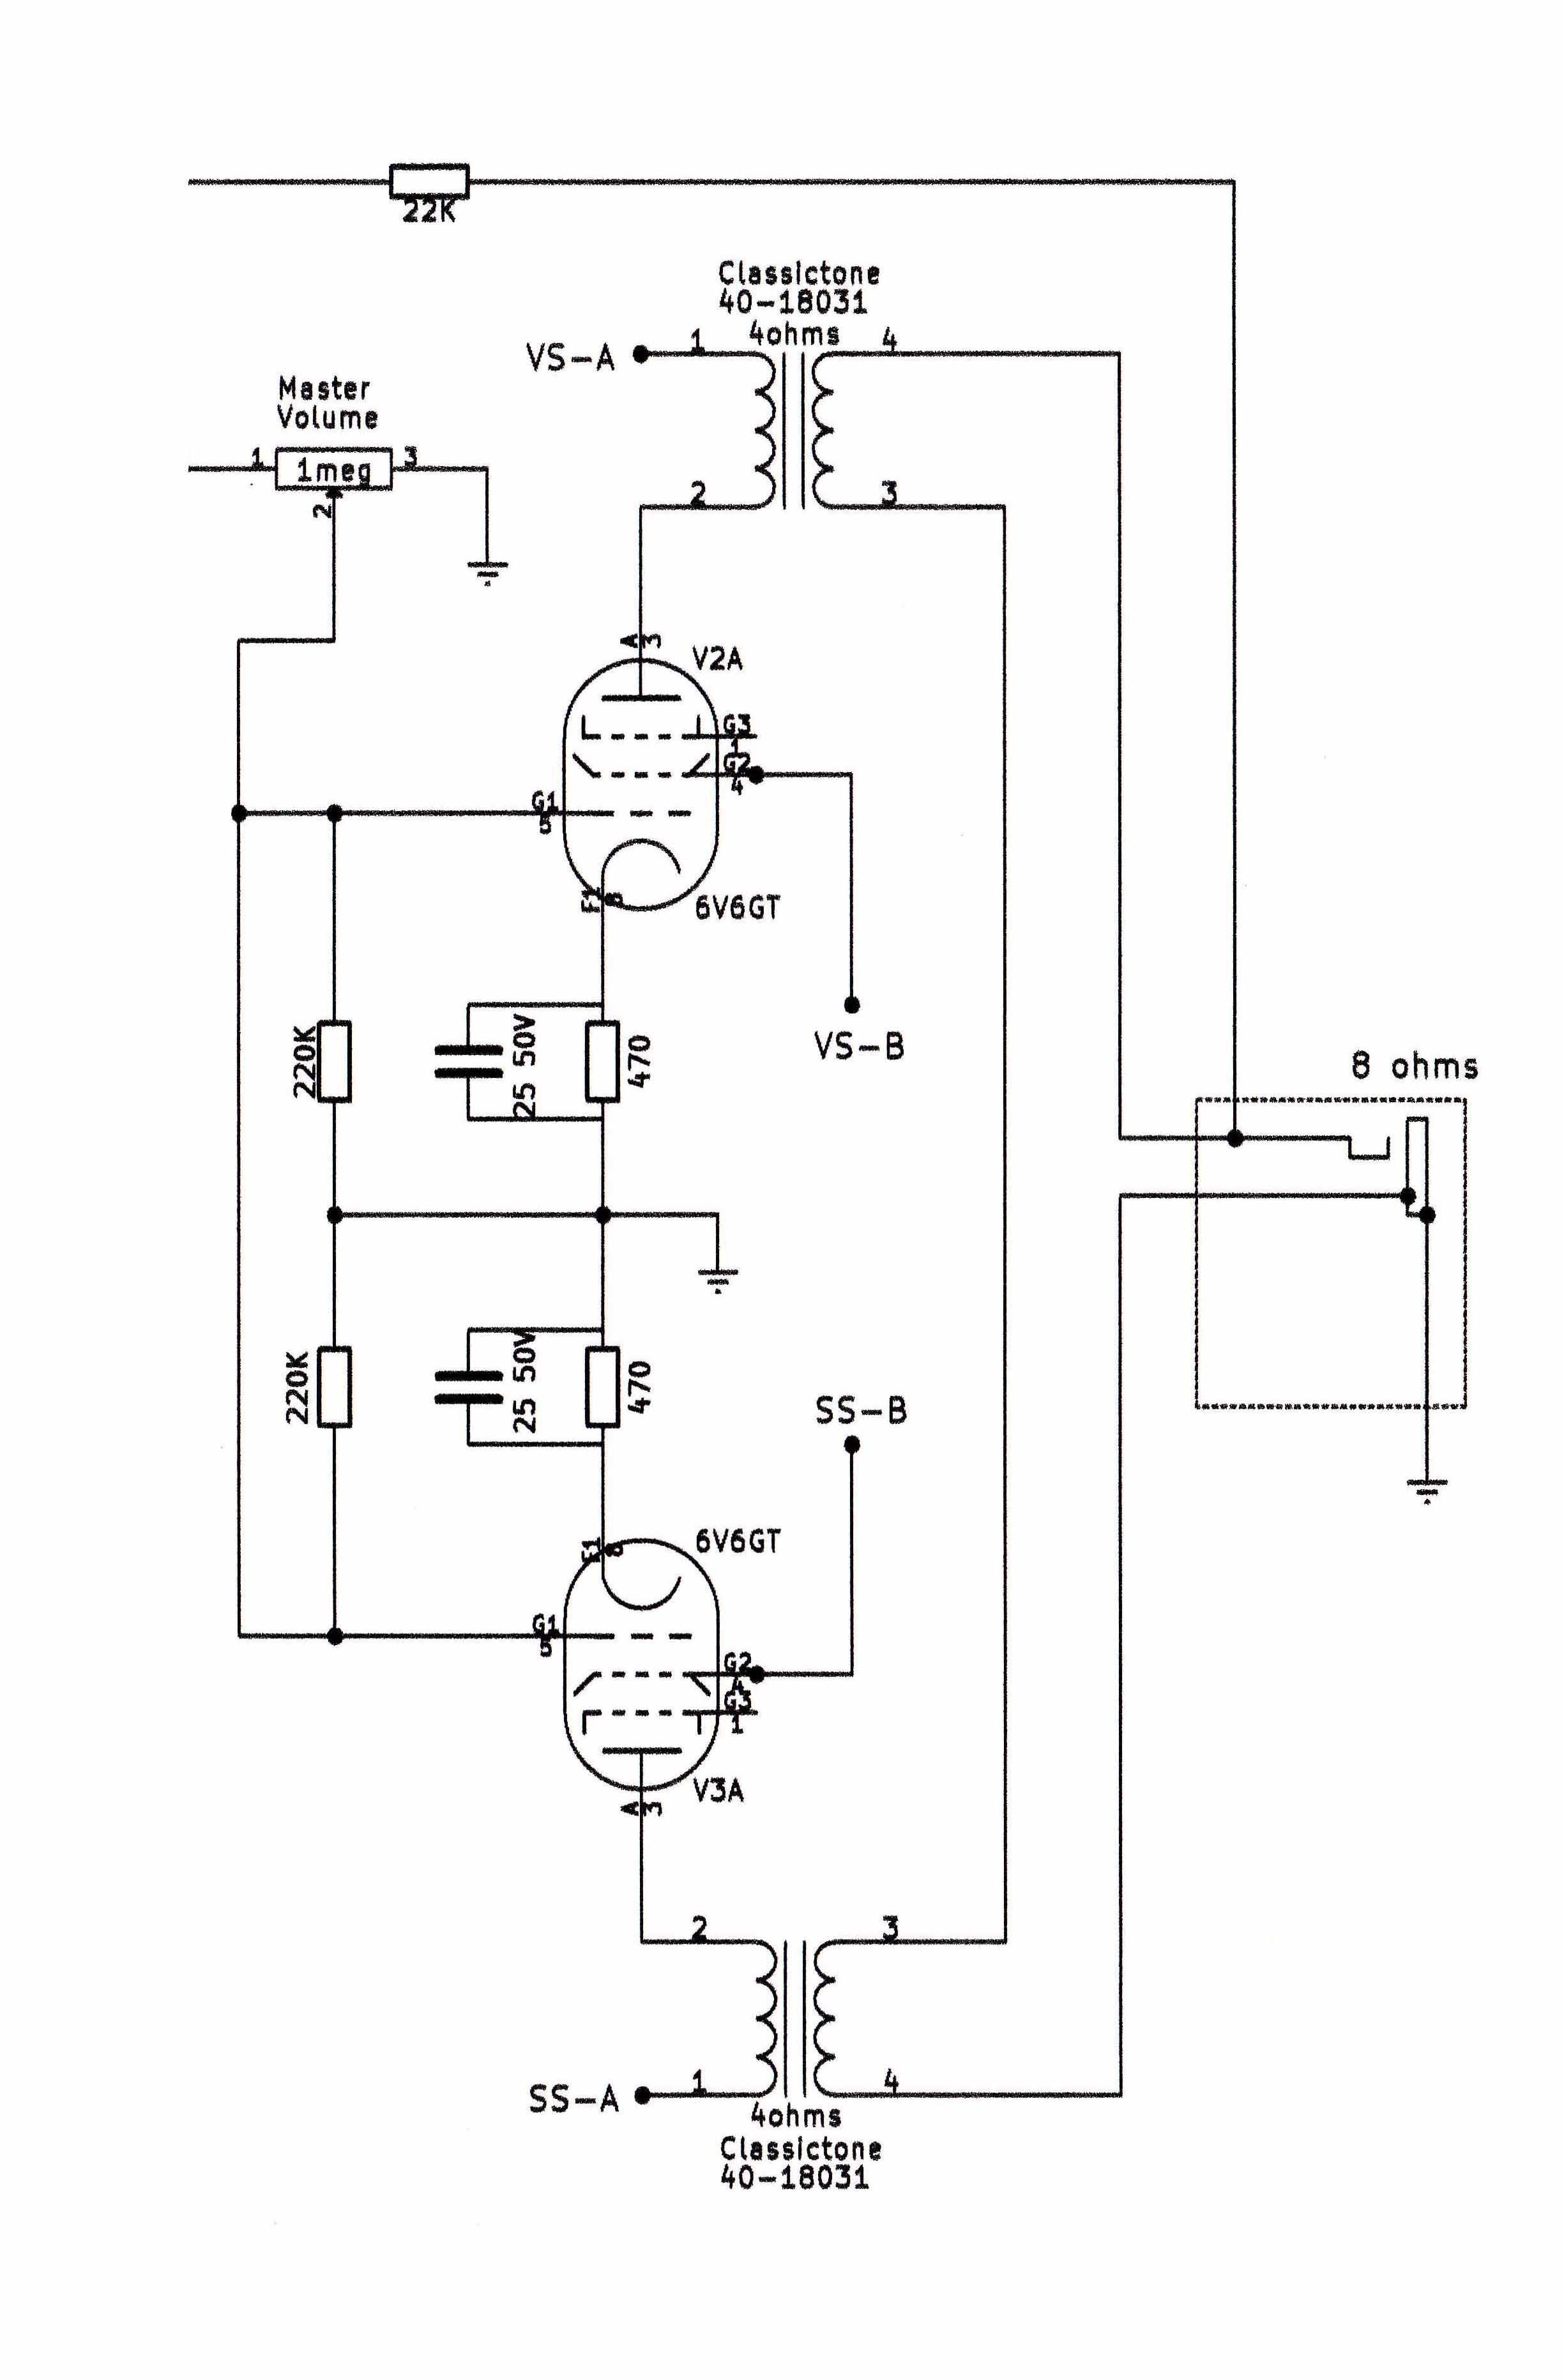 Transformer - Wiring 2 Audio Output Transfomer Secondaries In Series - Series Wiring Diagram